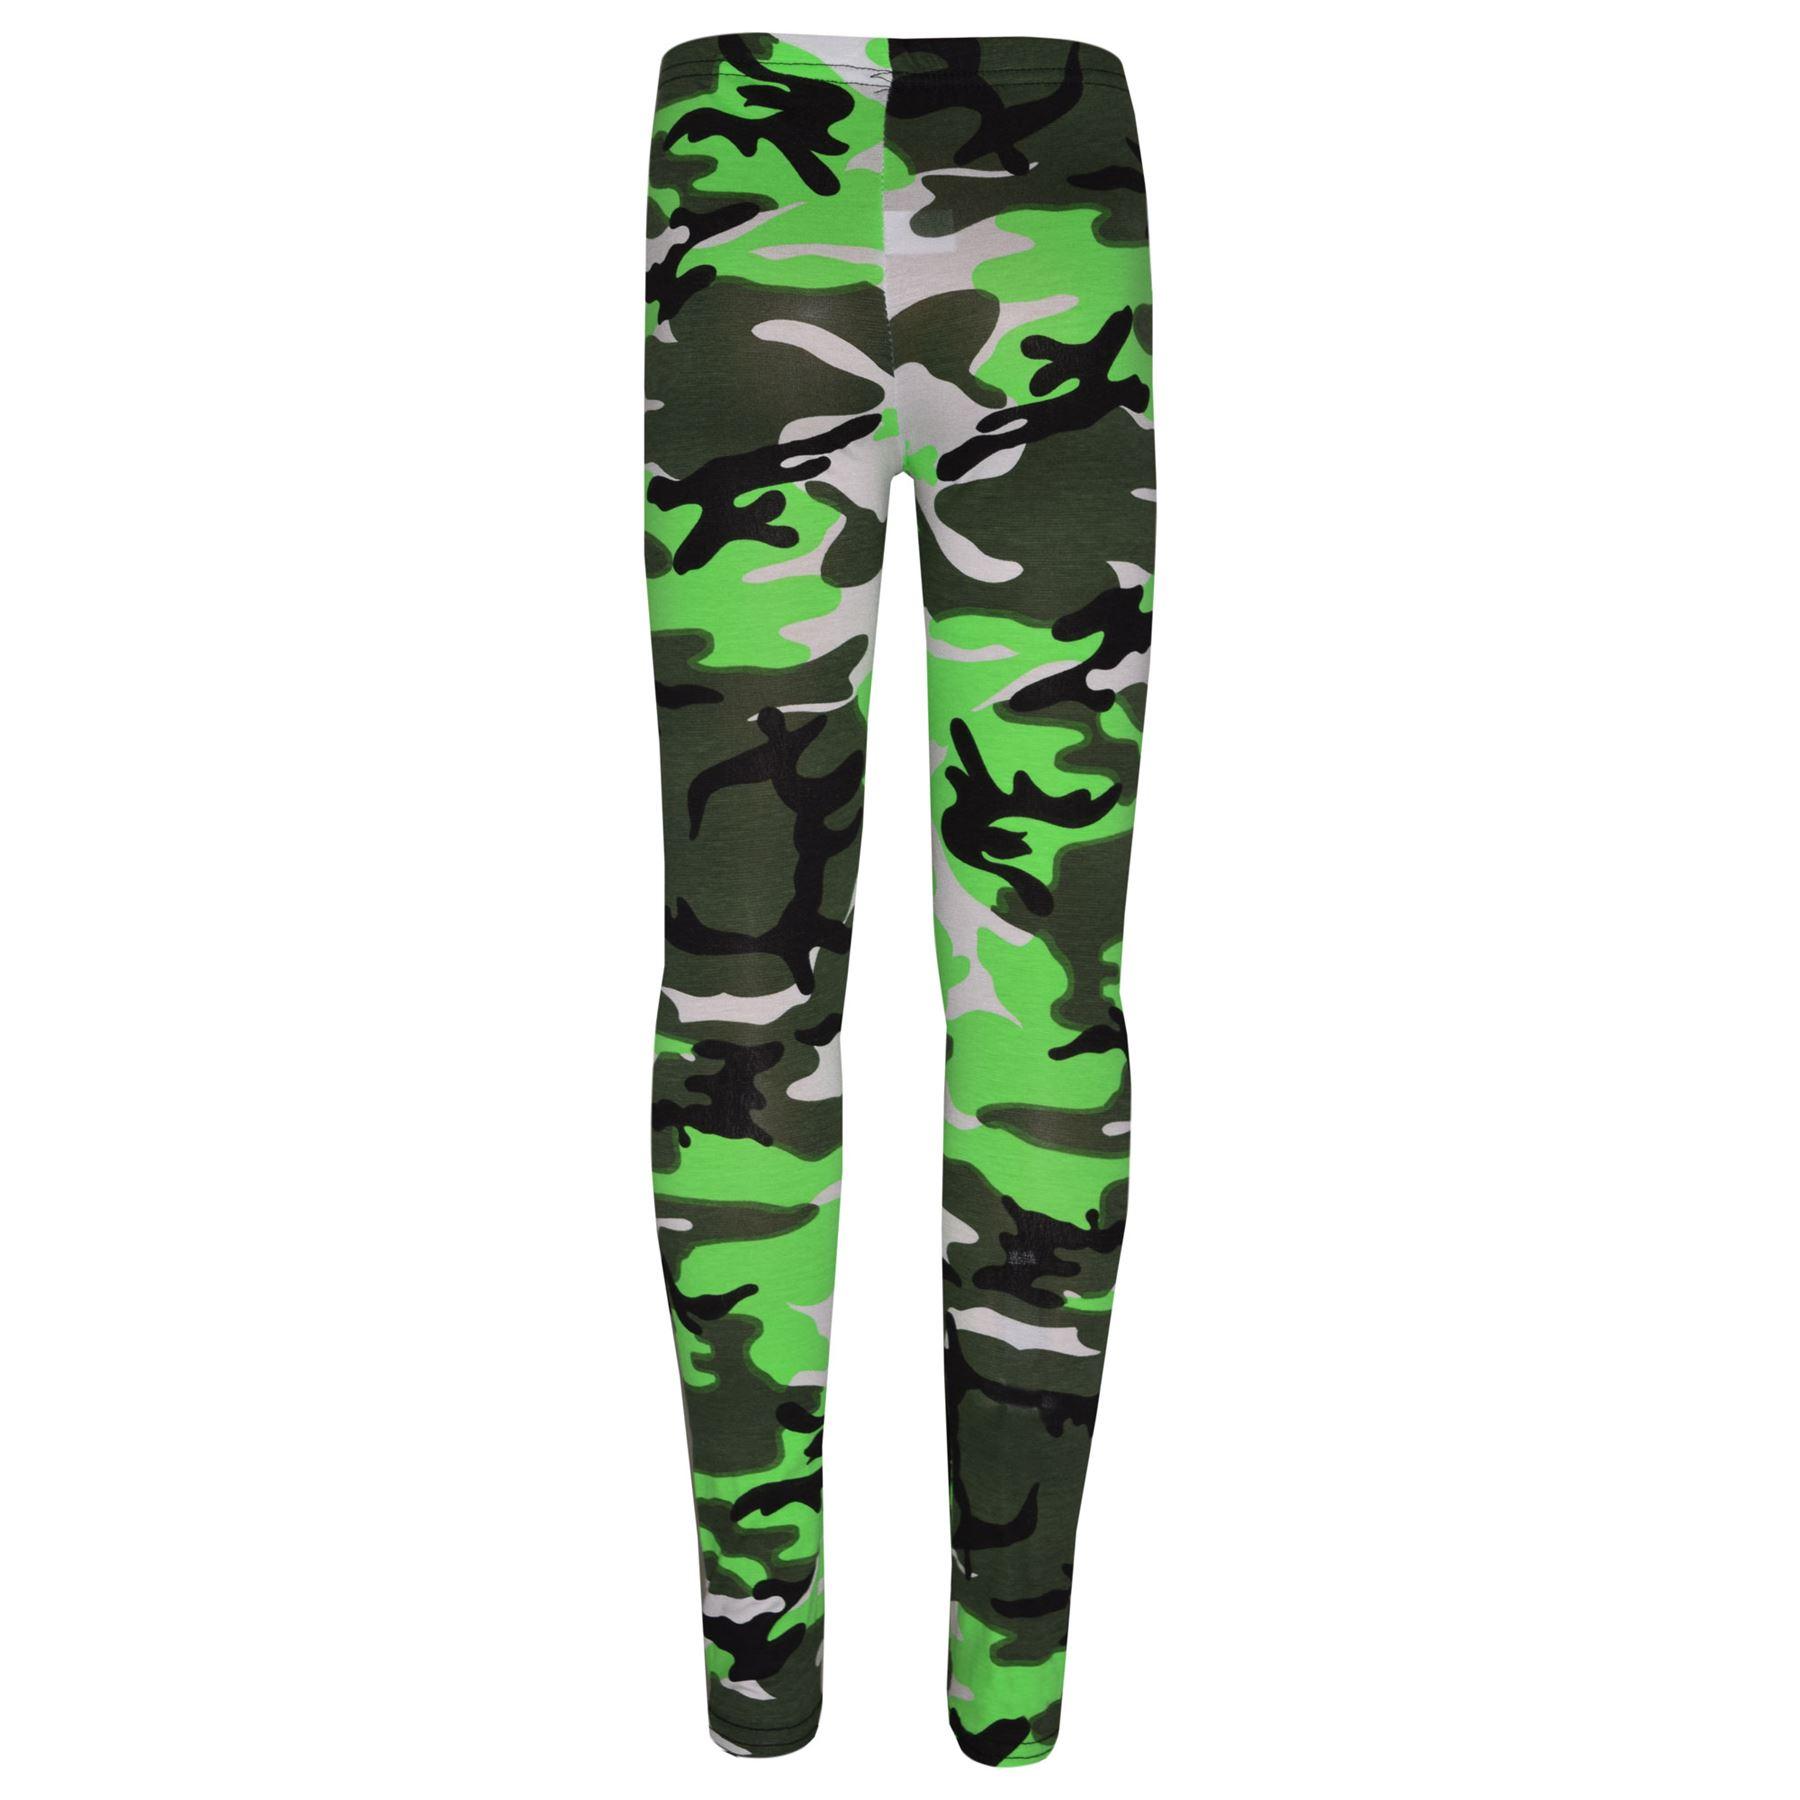 Girls-NEW-YORK-BROOKLYN-98-ATHLECTIC-Camouflage-Print-Top-amp-Legging-Set-7-13-Yr thumbnail 33